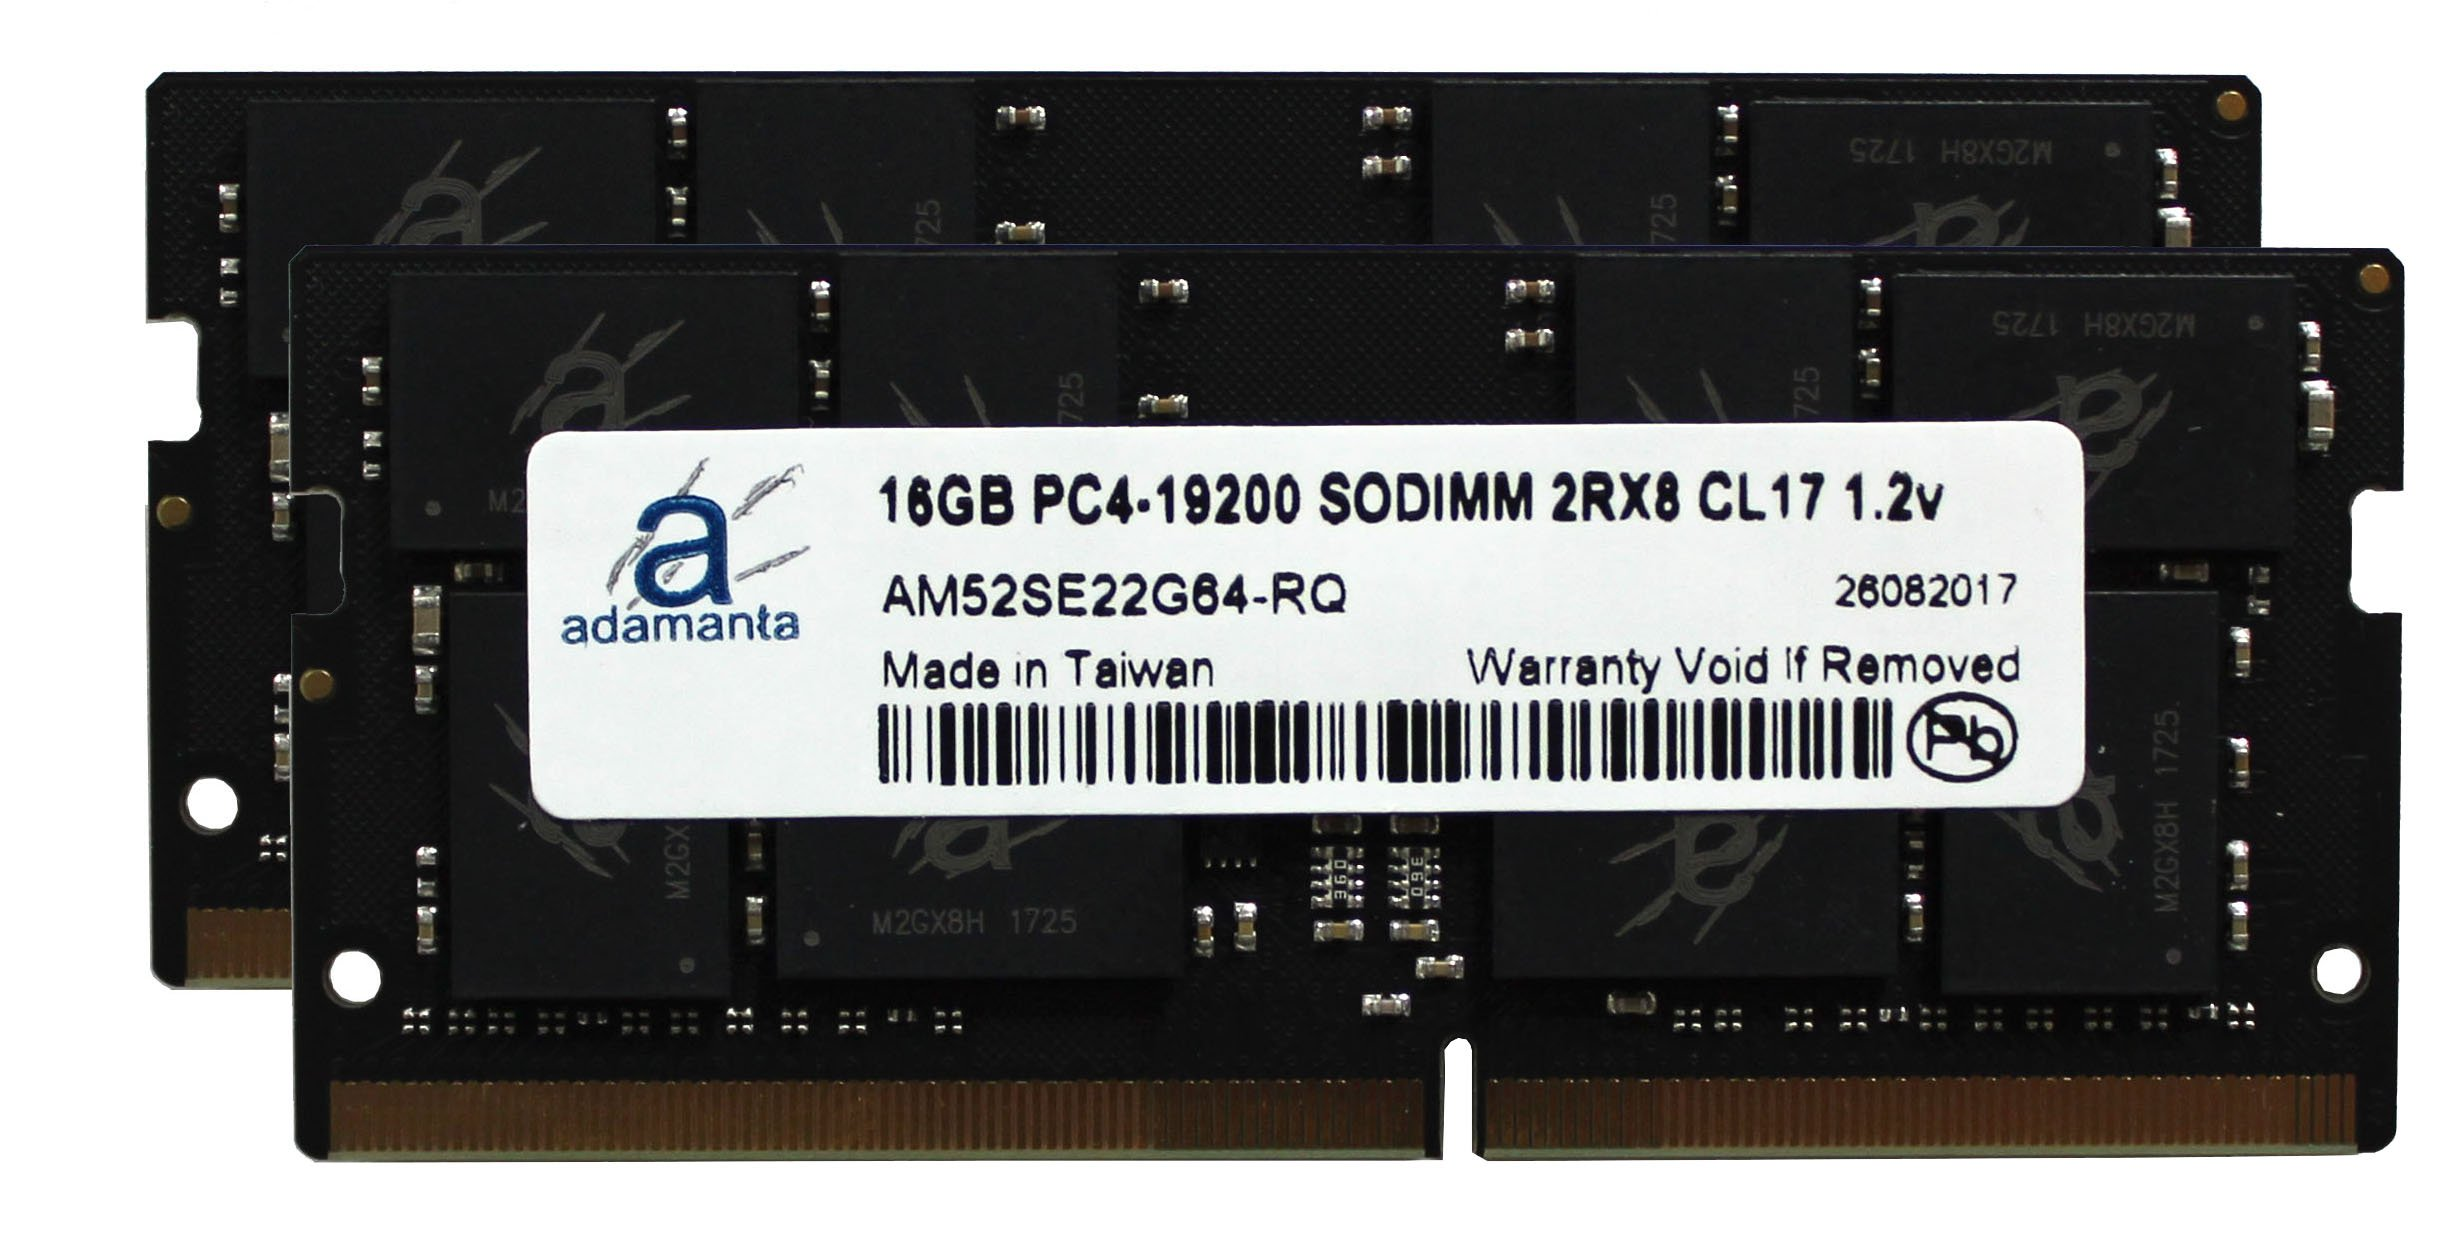 Adamanta 32GB (2x16GB) Memory Upgrade for Apple iMac 2017 27'' Retina 5K Display DDR4 2400Mhz PC4-19200 SODIMM 2Rx8 CL17 1.2v Dual Rank RAM DRAM by Adamanta Memory